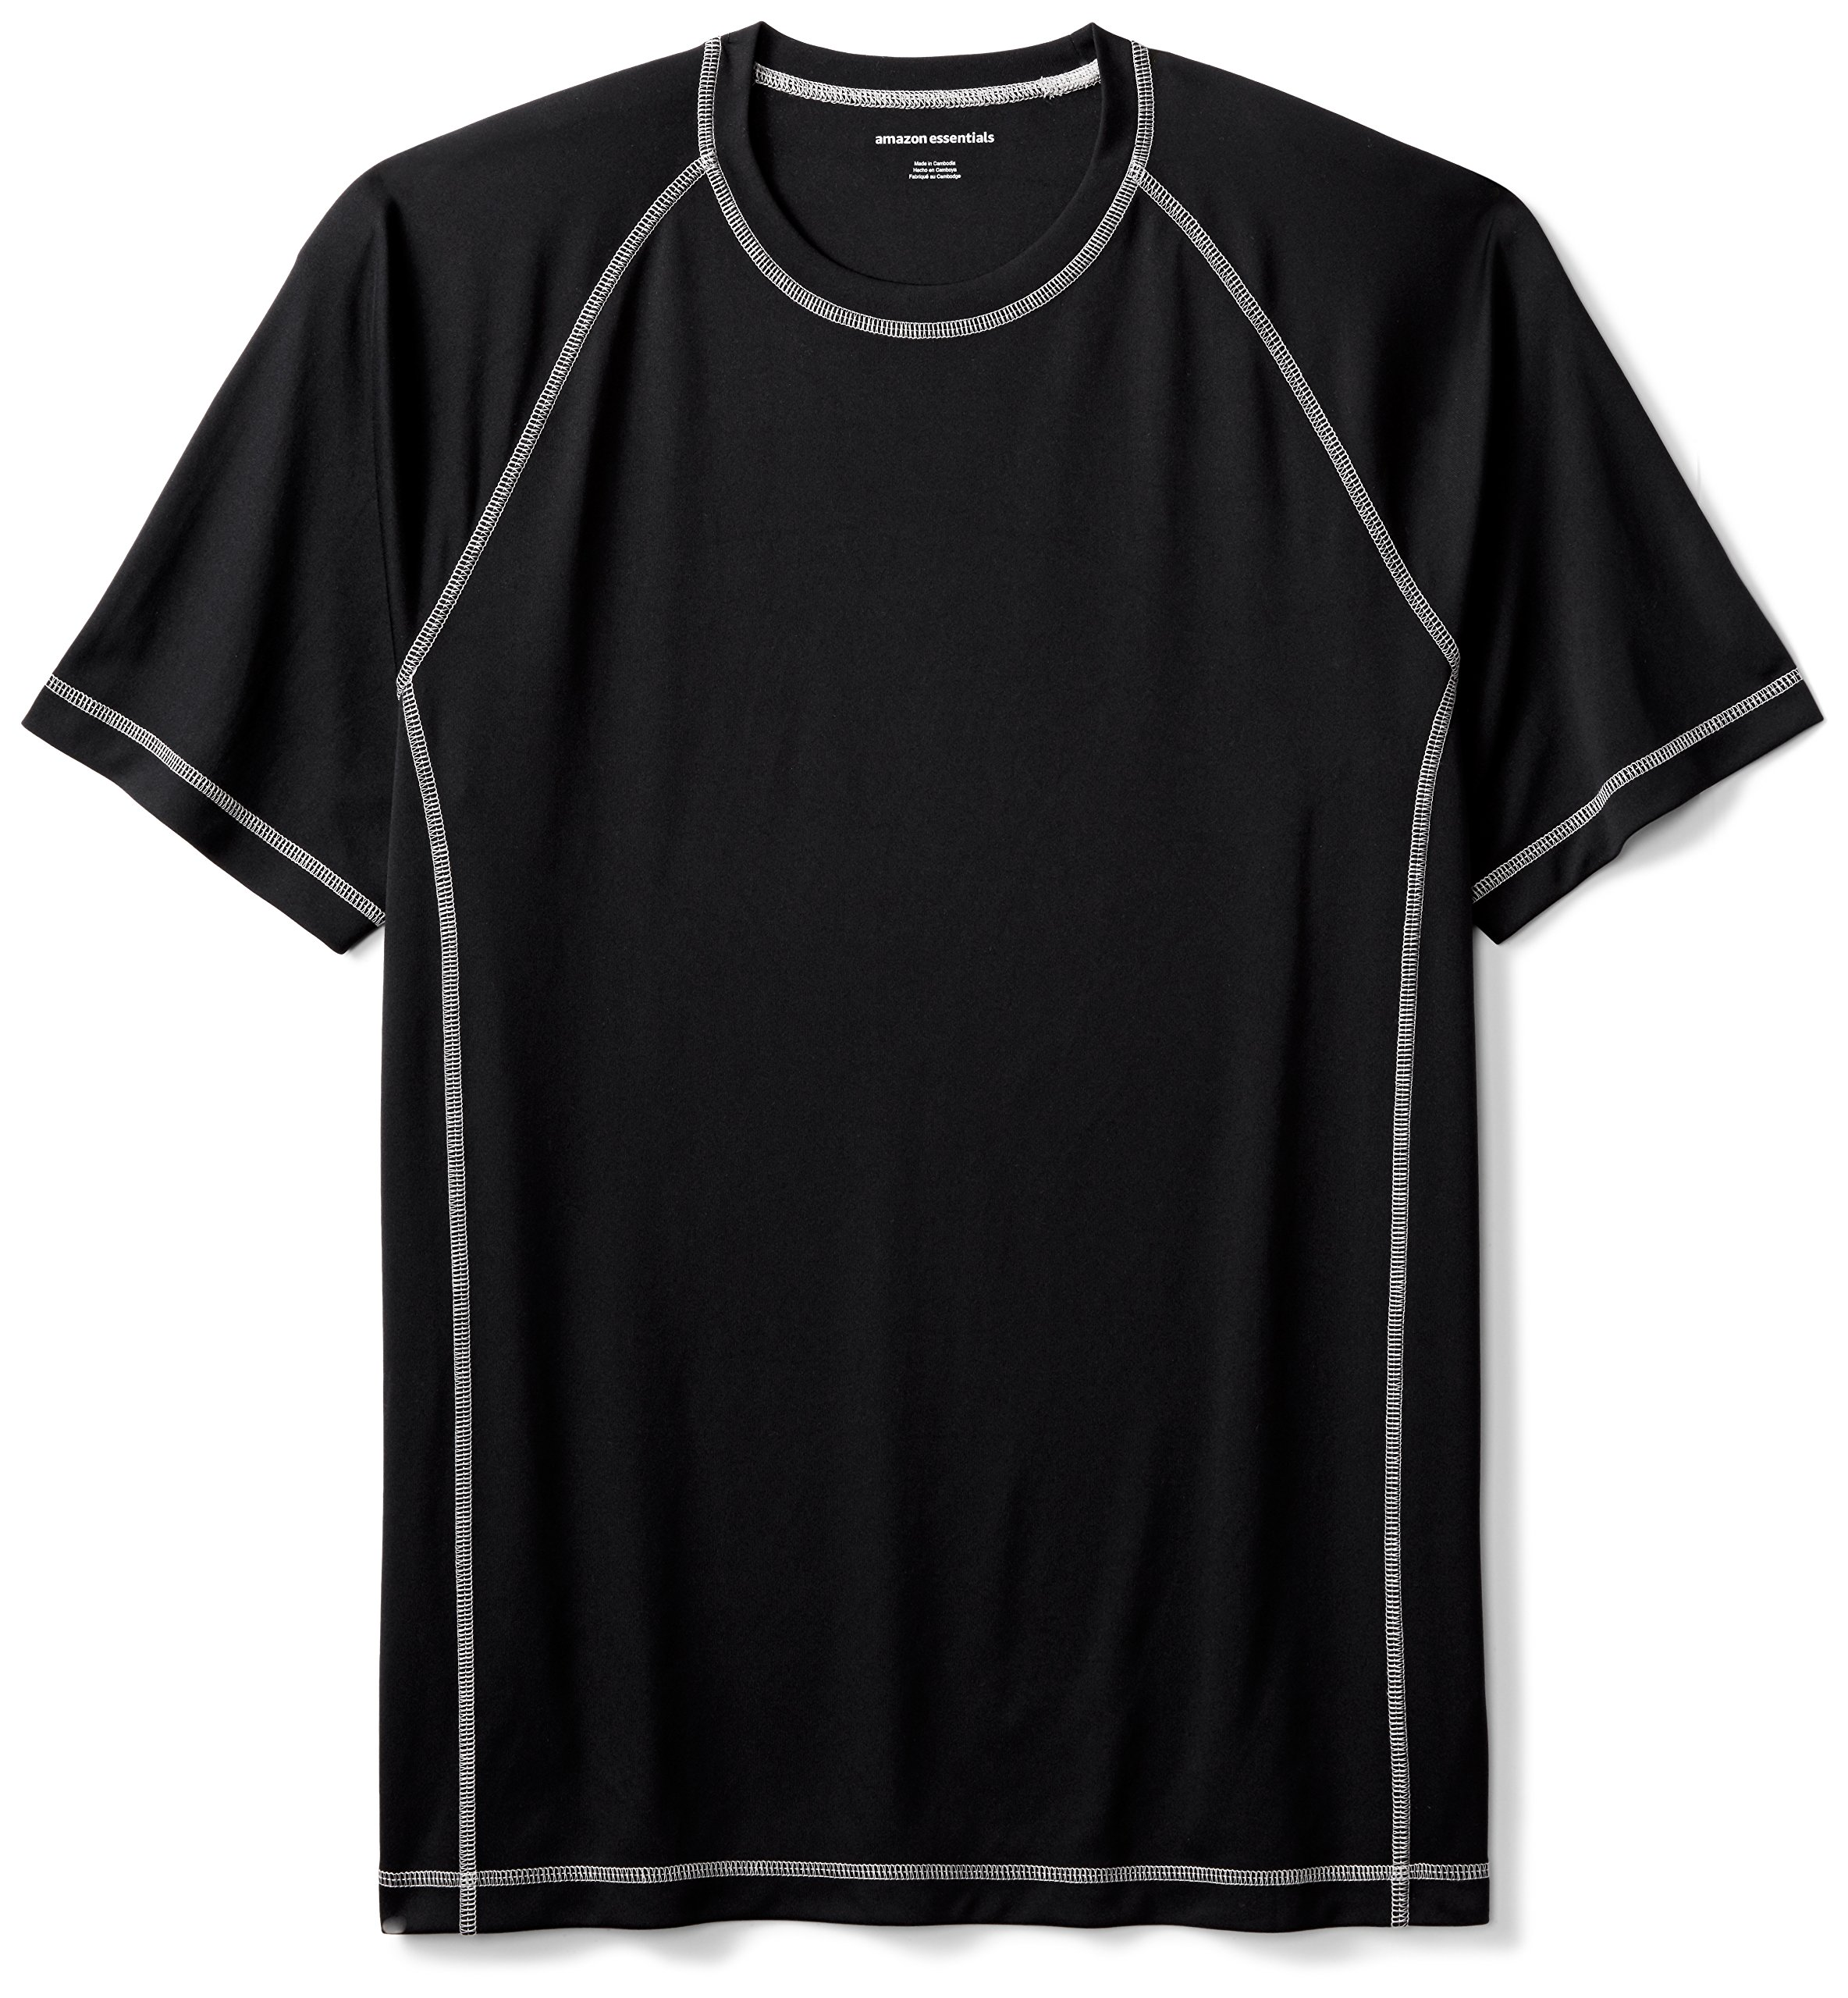 Amazon Essentials Men's Short-Sleeve Quick-Dry UPF 50 Swim Tee, Black, X-Large